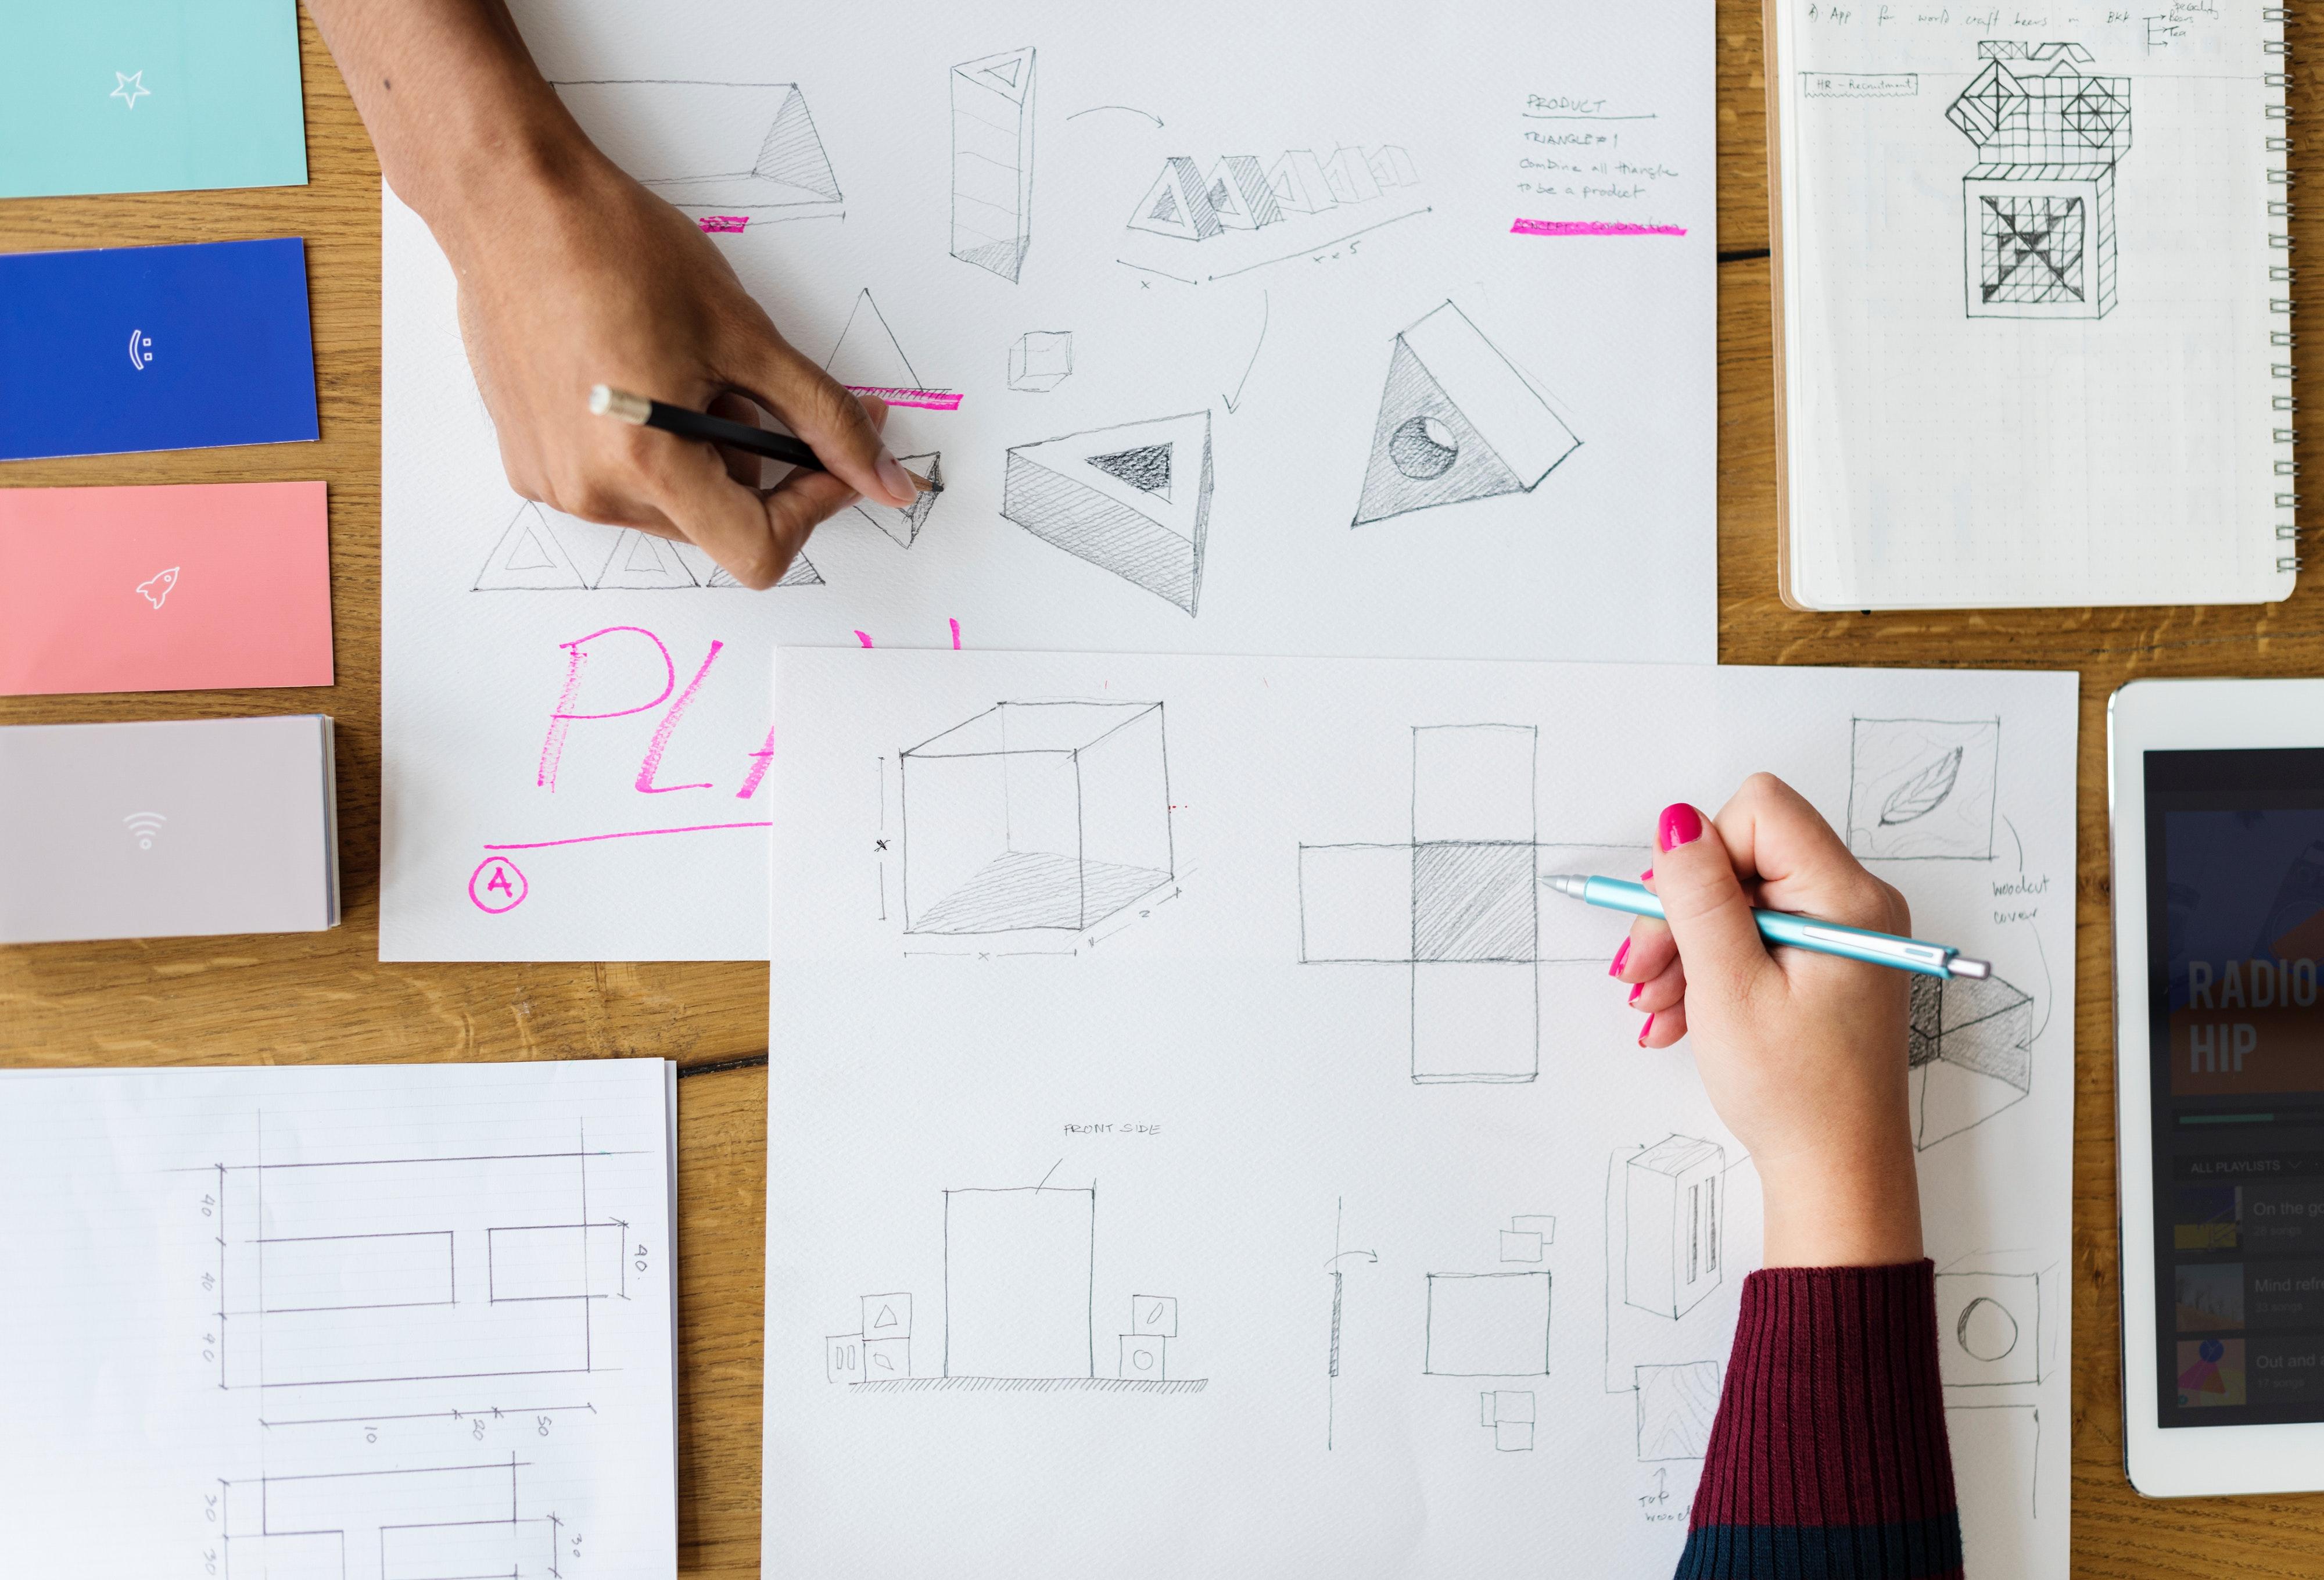 creative-creativity-design-design work